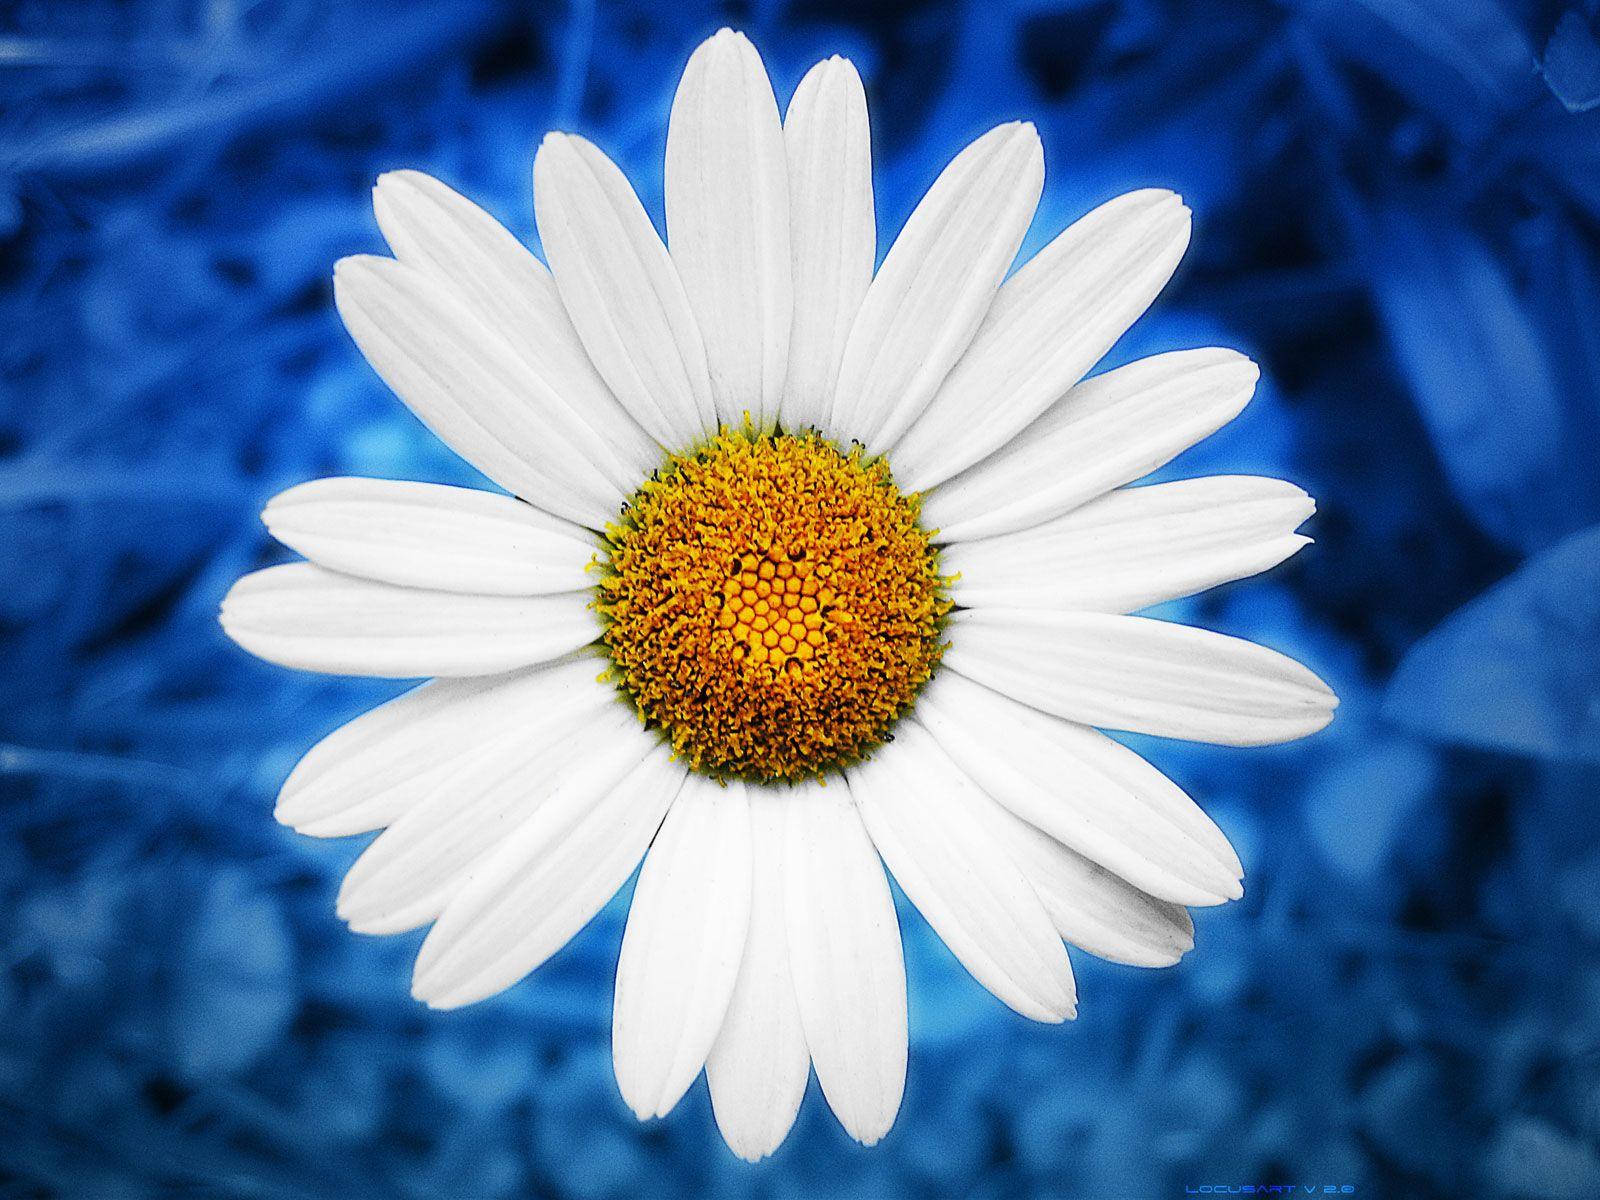 Pris sur le net photoimagemusiquevideo ect pris sur le net au pris sur le net april birth flowersdaisy izmirmasajfo